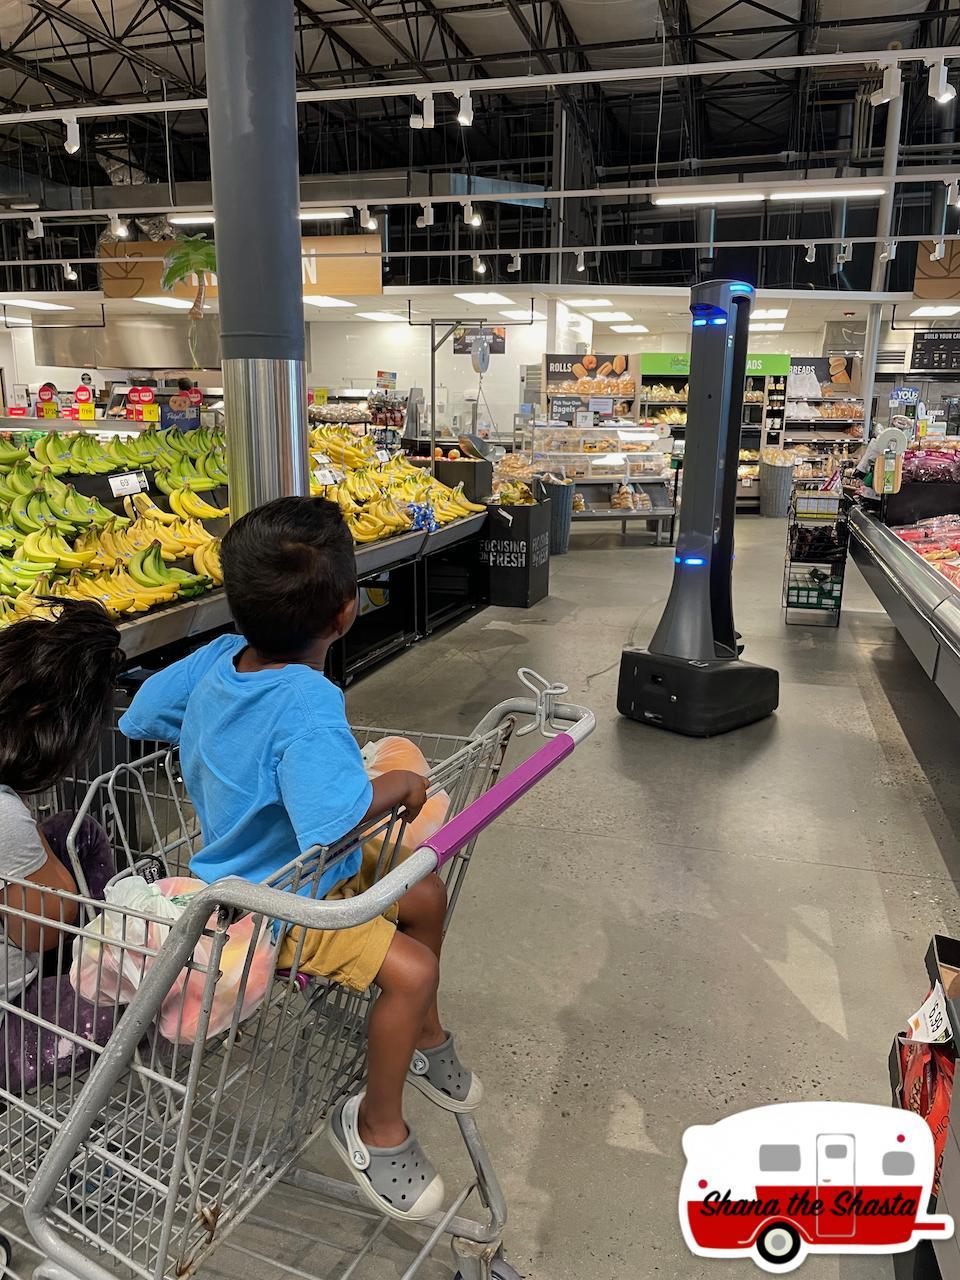 Menacing-Covid-Robot-at-Grocery-Store